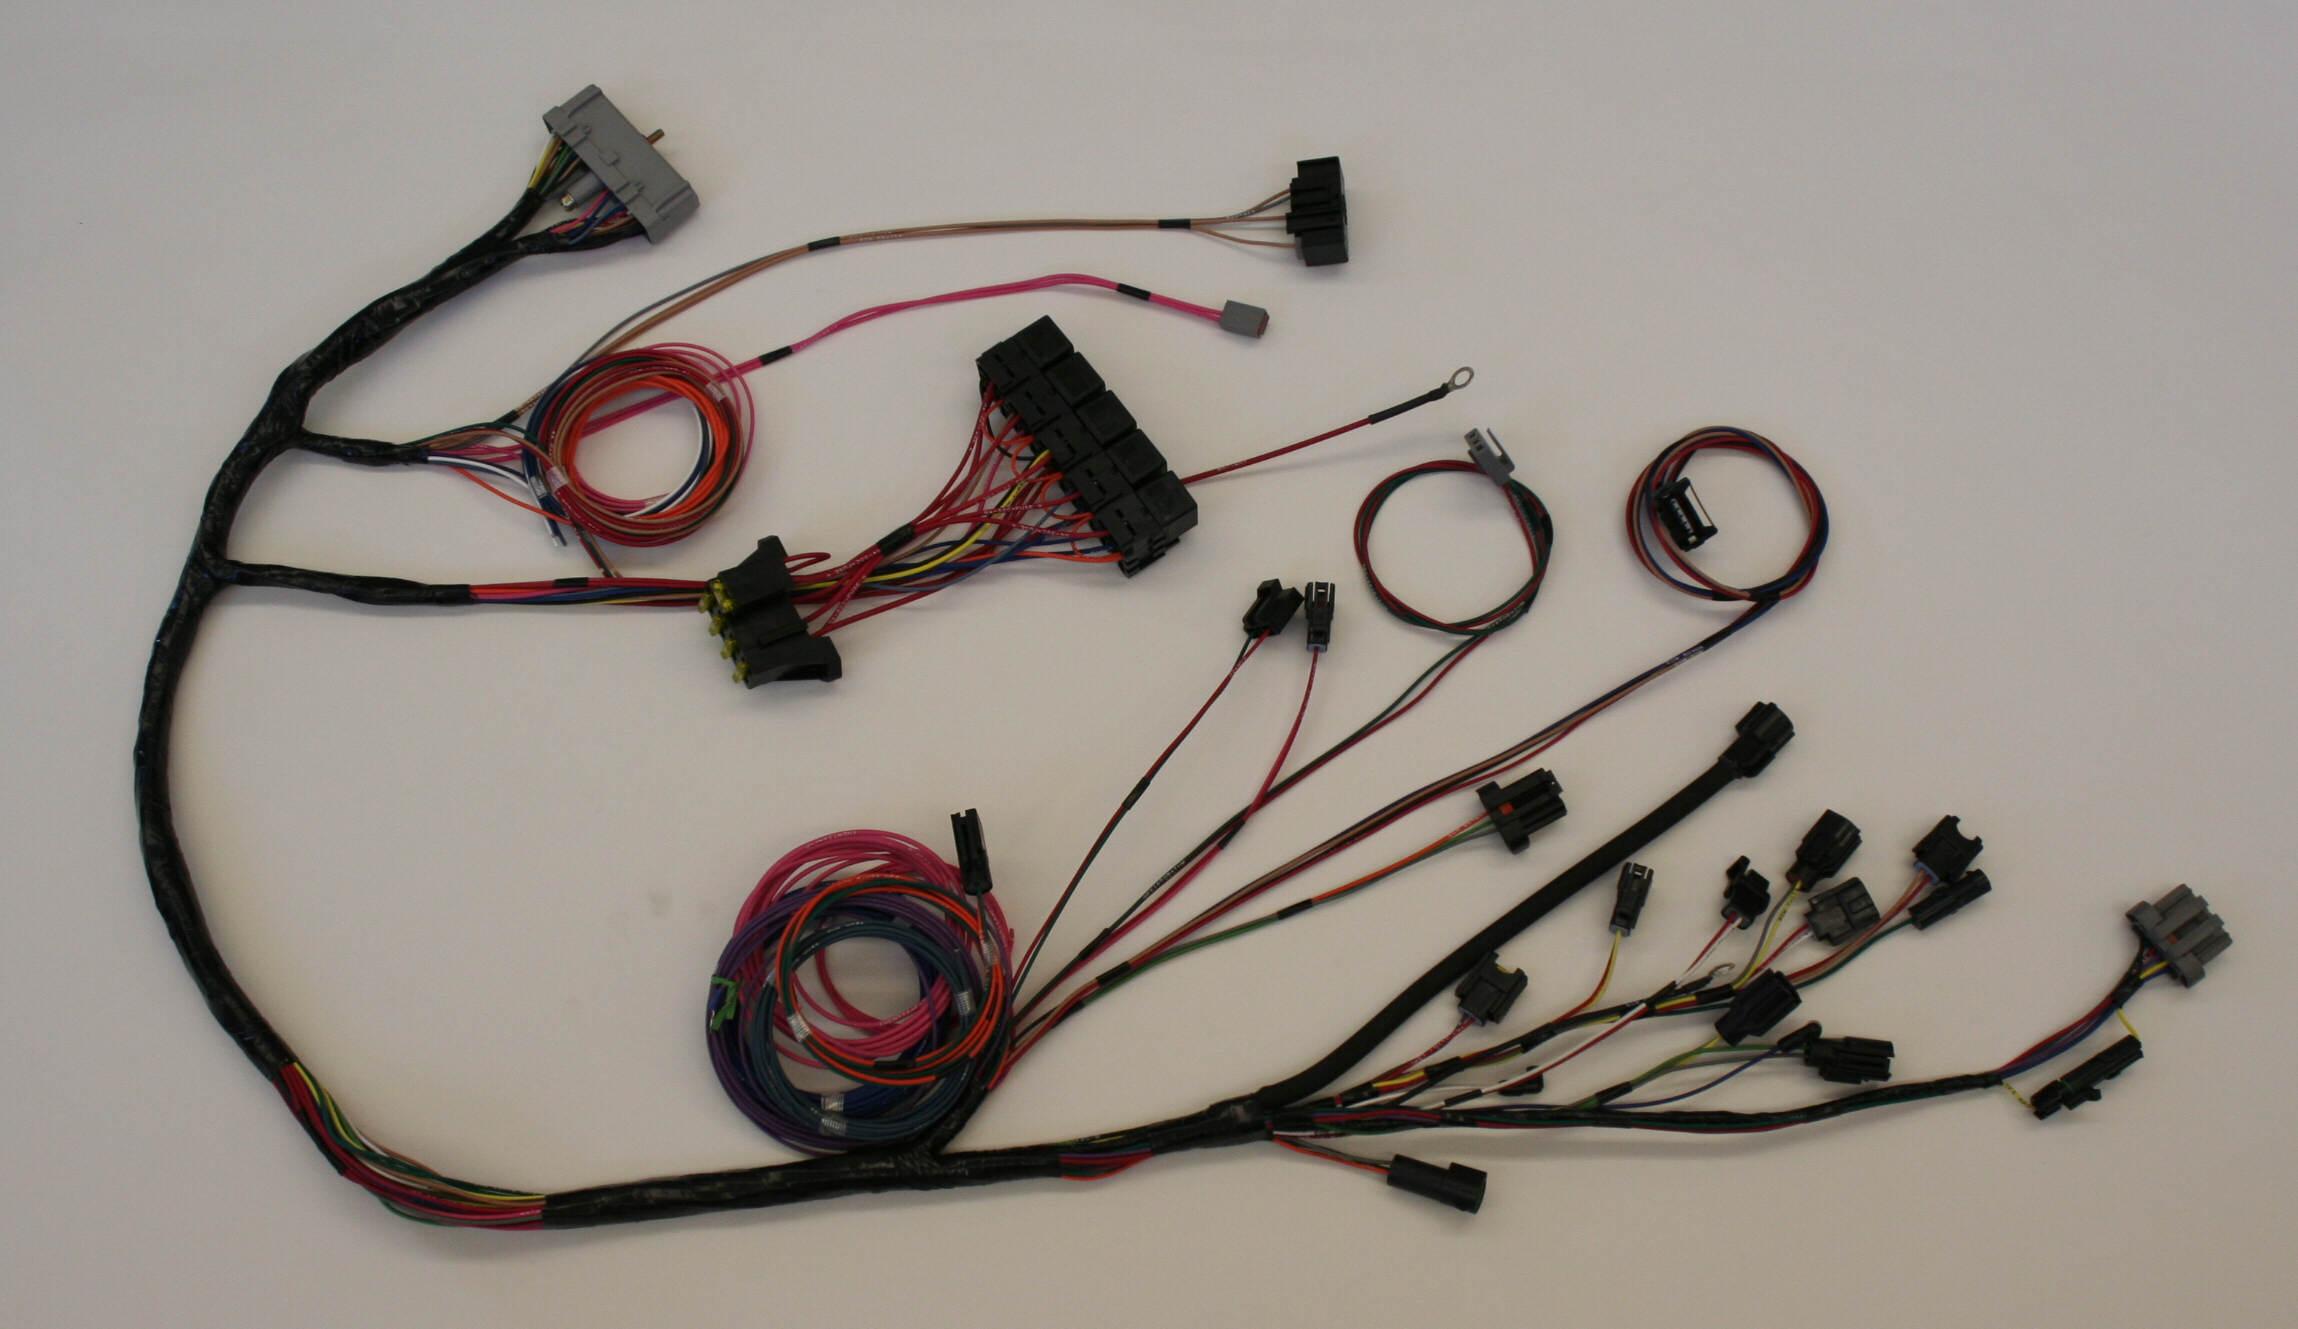 1996 ford explorer headlight wiring diagram 2005 grand cherokee radio replacement harnesses